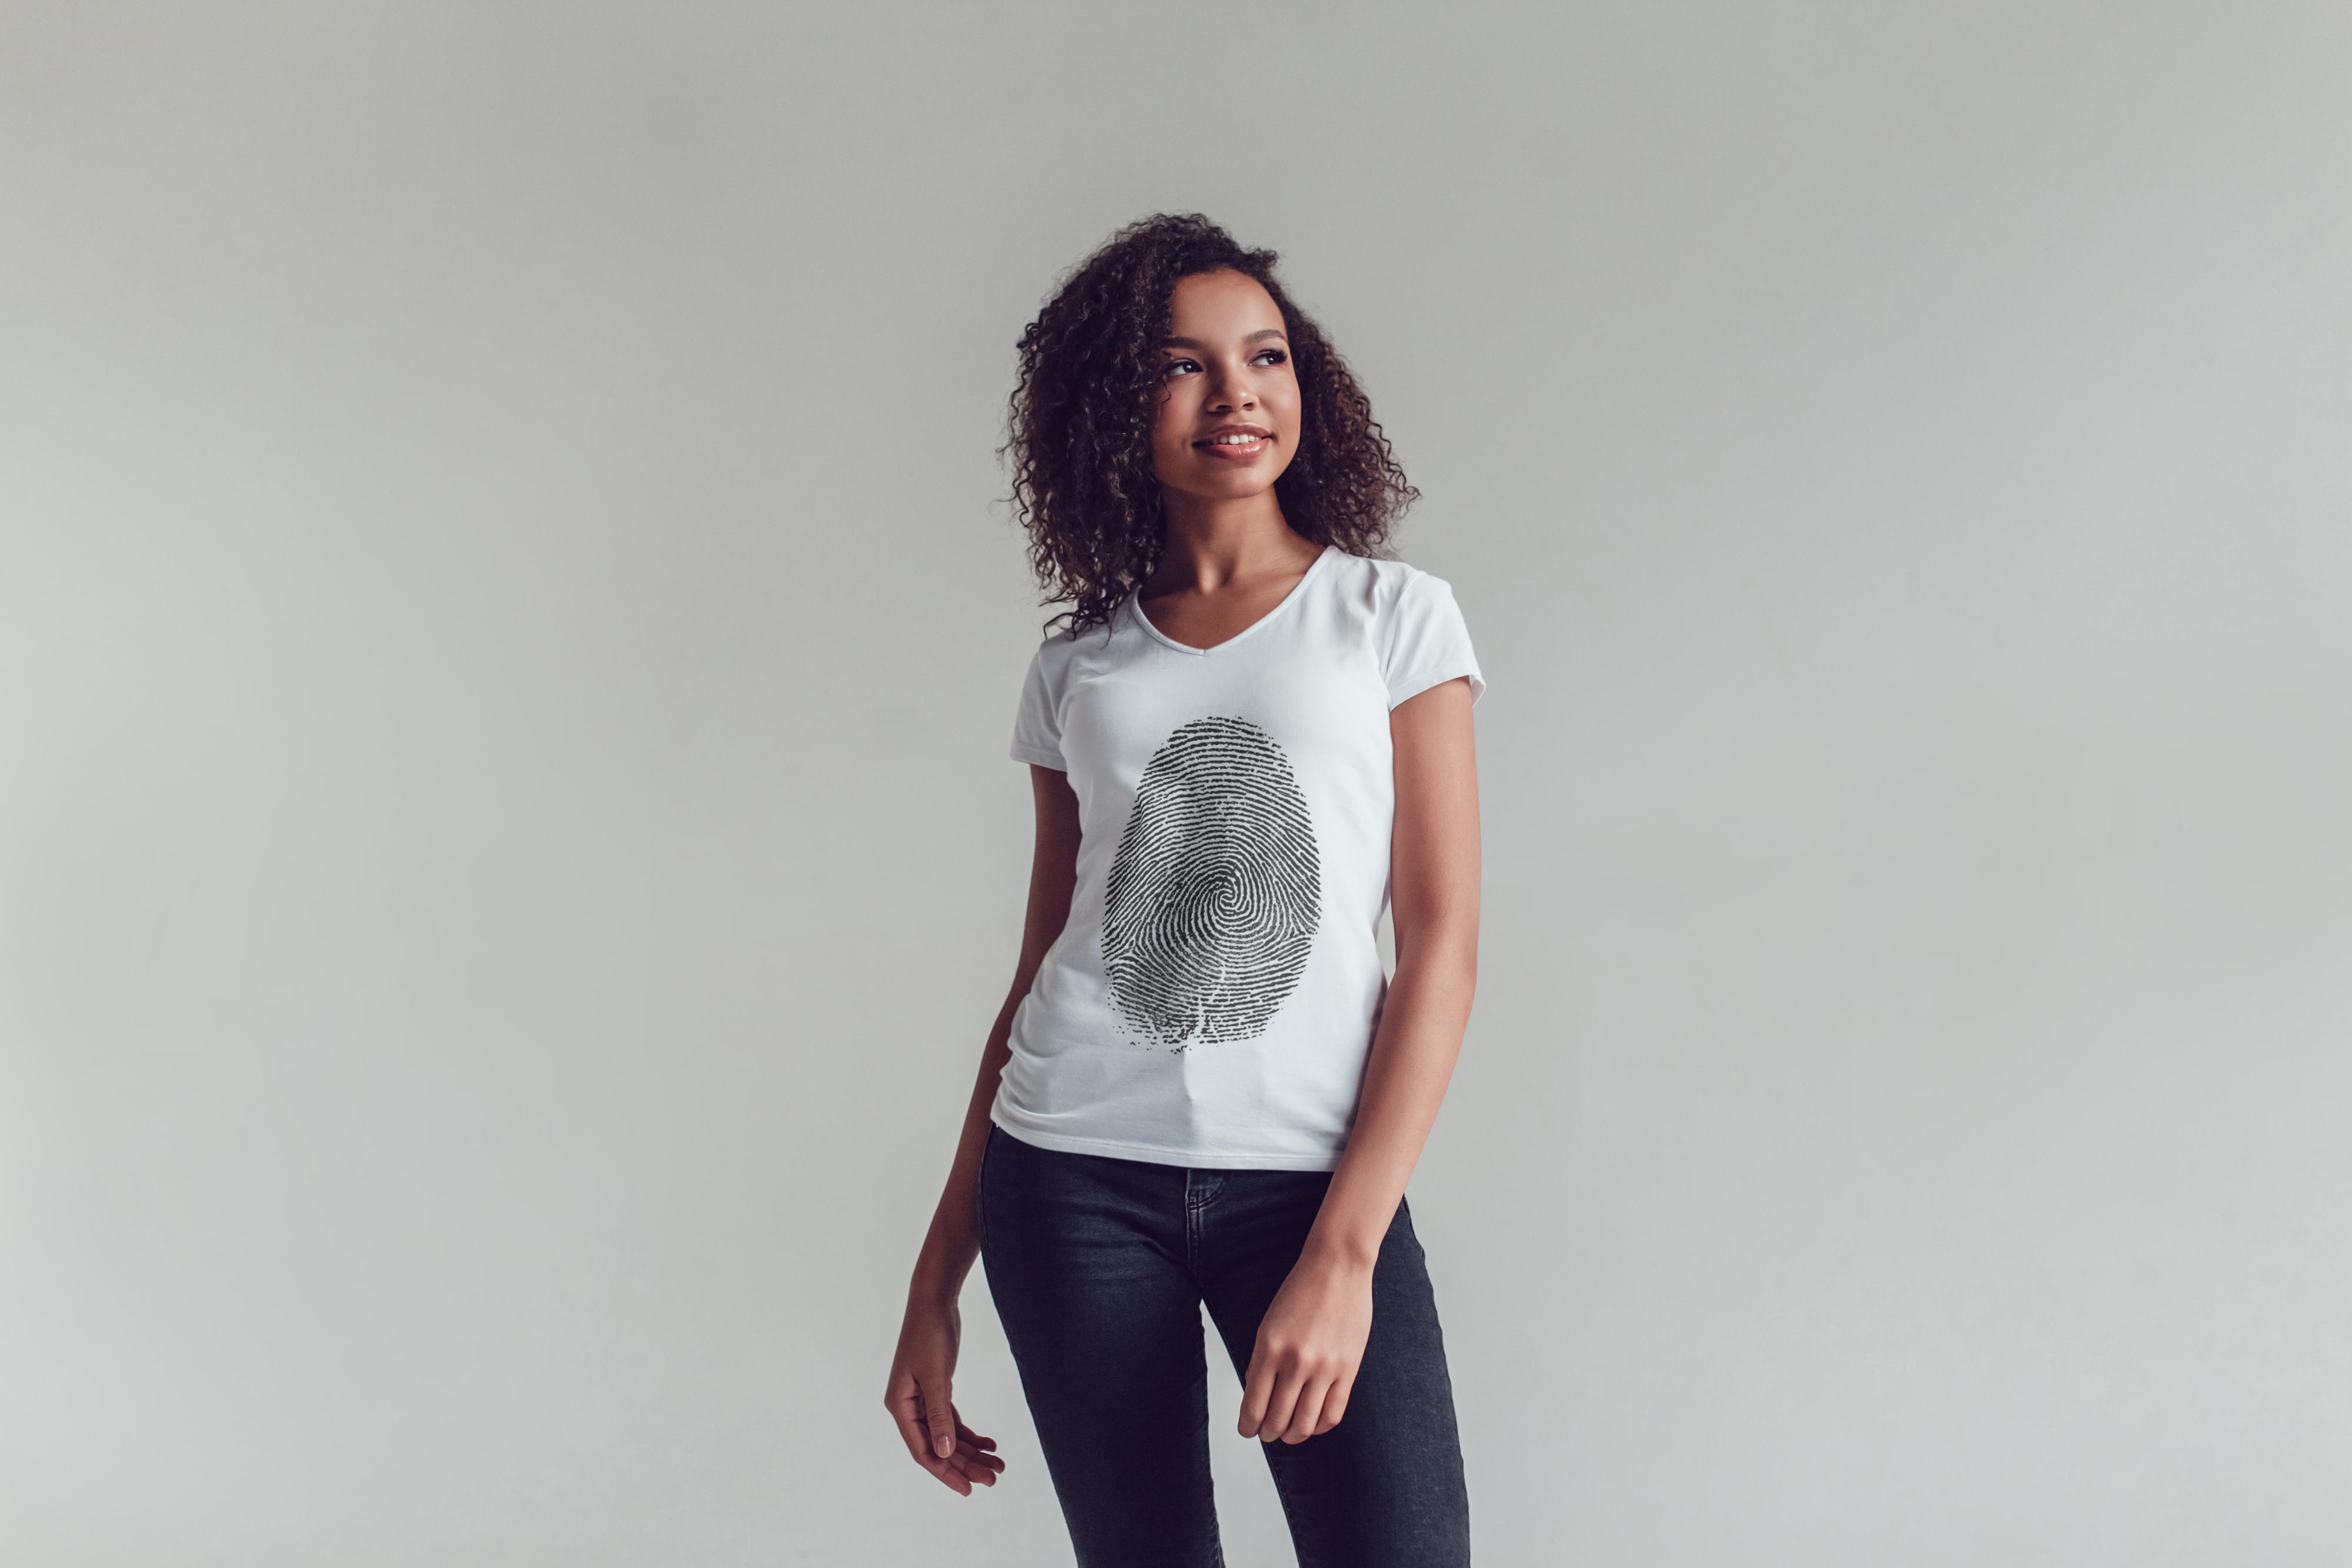 T-Shirt Mock-Up Vol.20 2017 example image 11